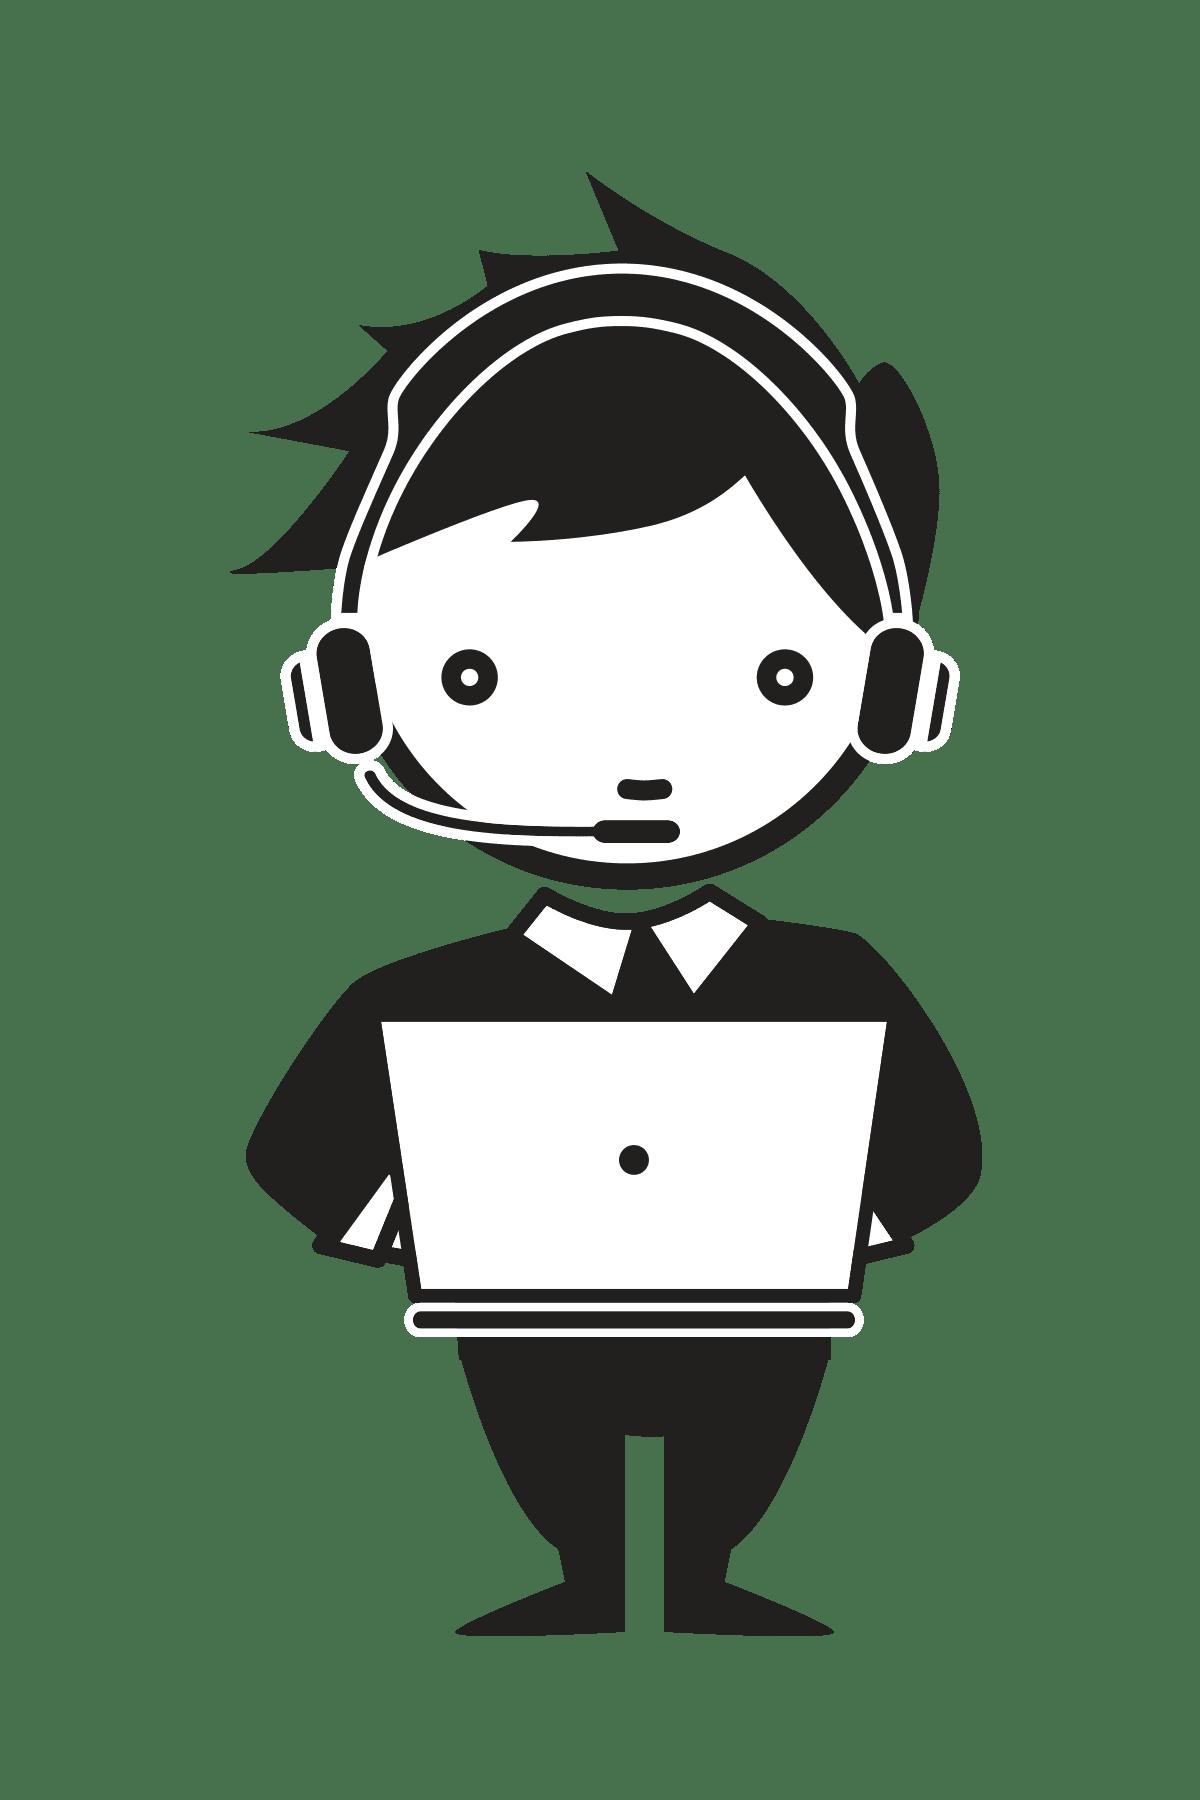 Training-Microsoft-Luis | Bitext  We help AI understand humans